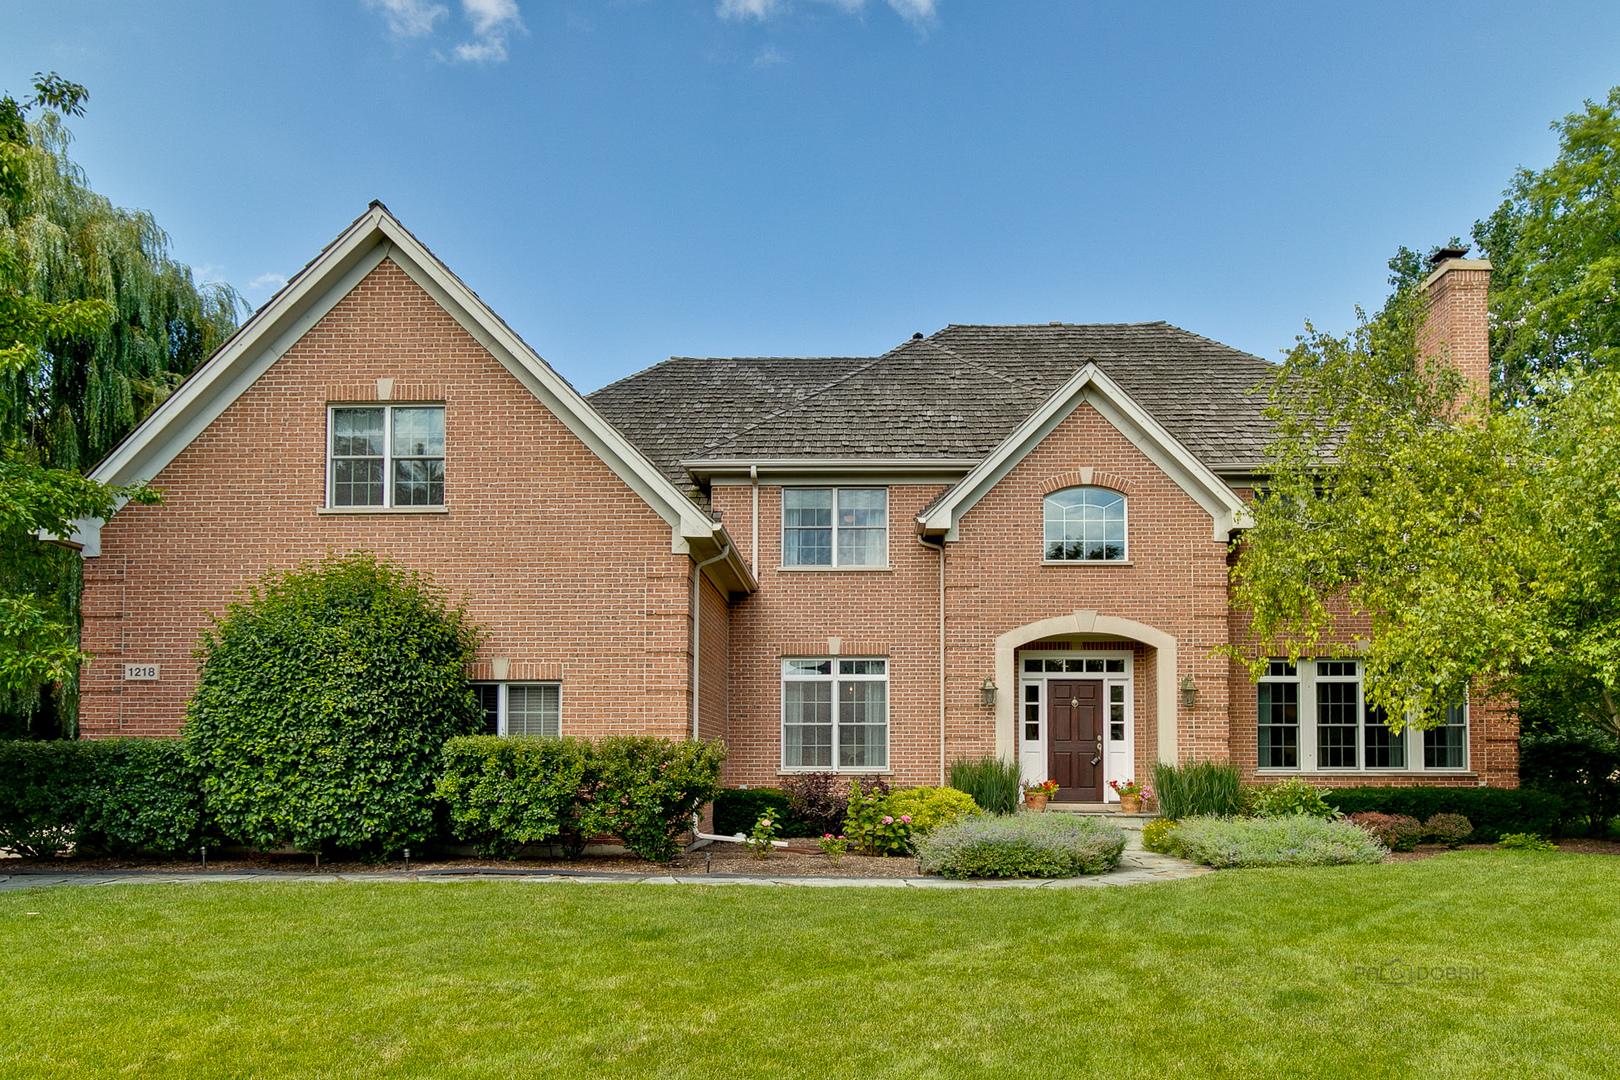 1218 Checkerberry Court, Libertyville, Illinois 60048